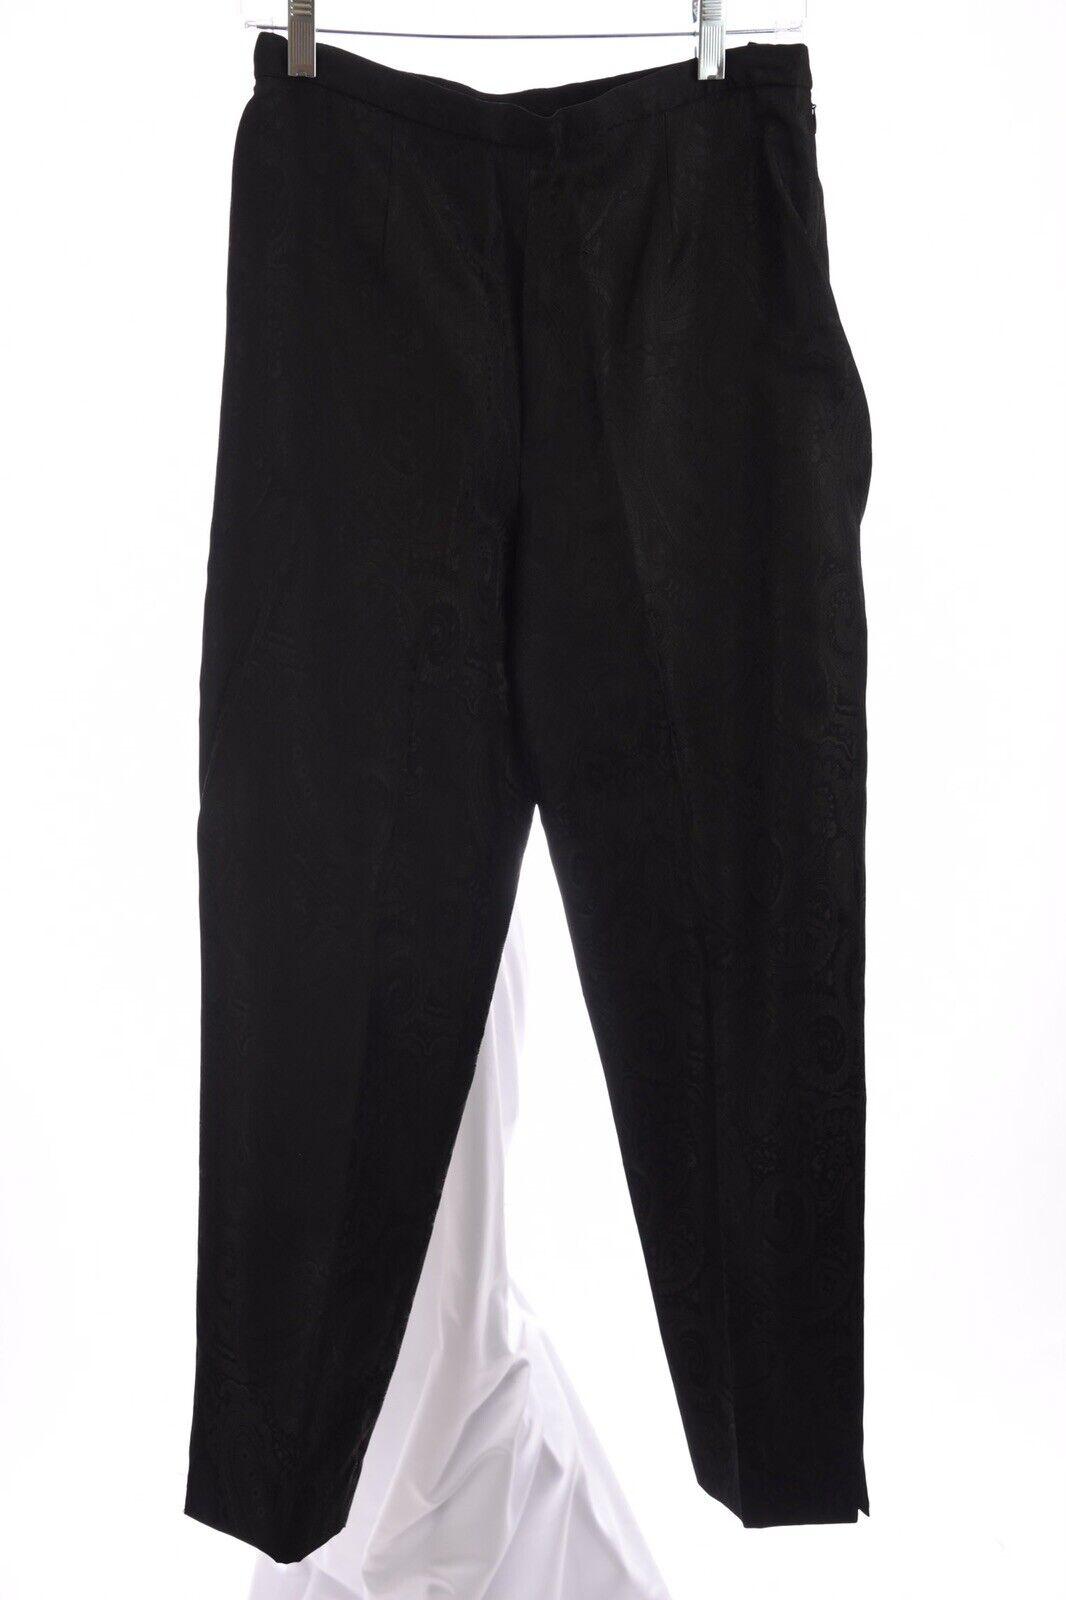 Jones York país para Mujer Vestido Jacquard New  Pantalones Impresión Negro Talla 8 medio  marcas de moda